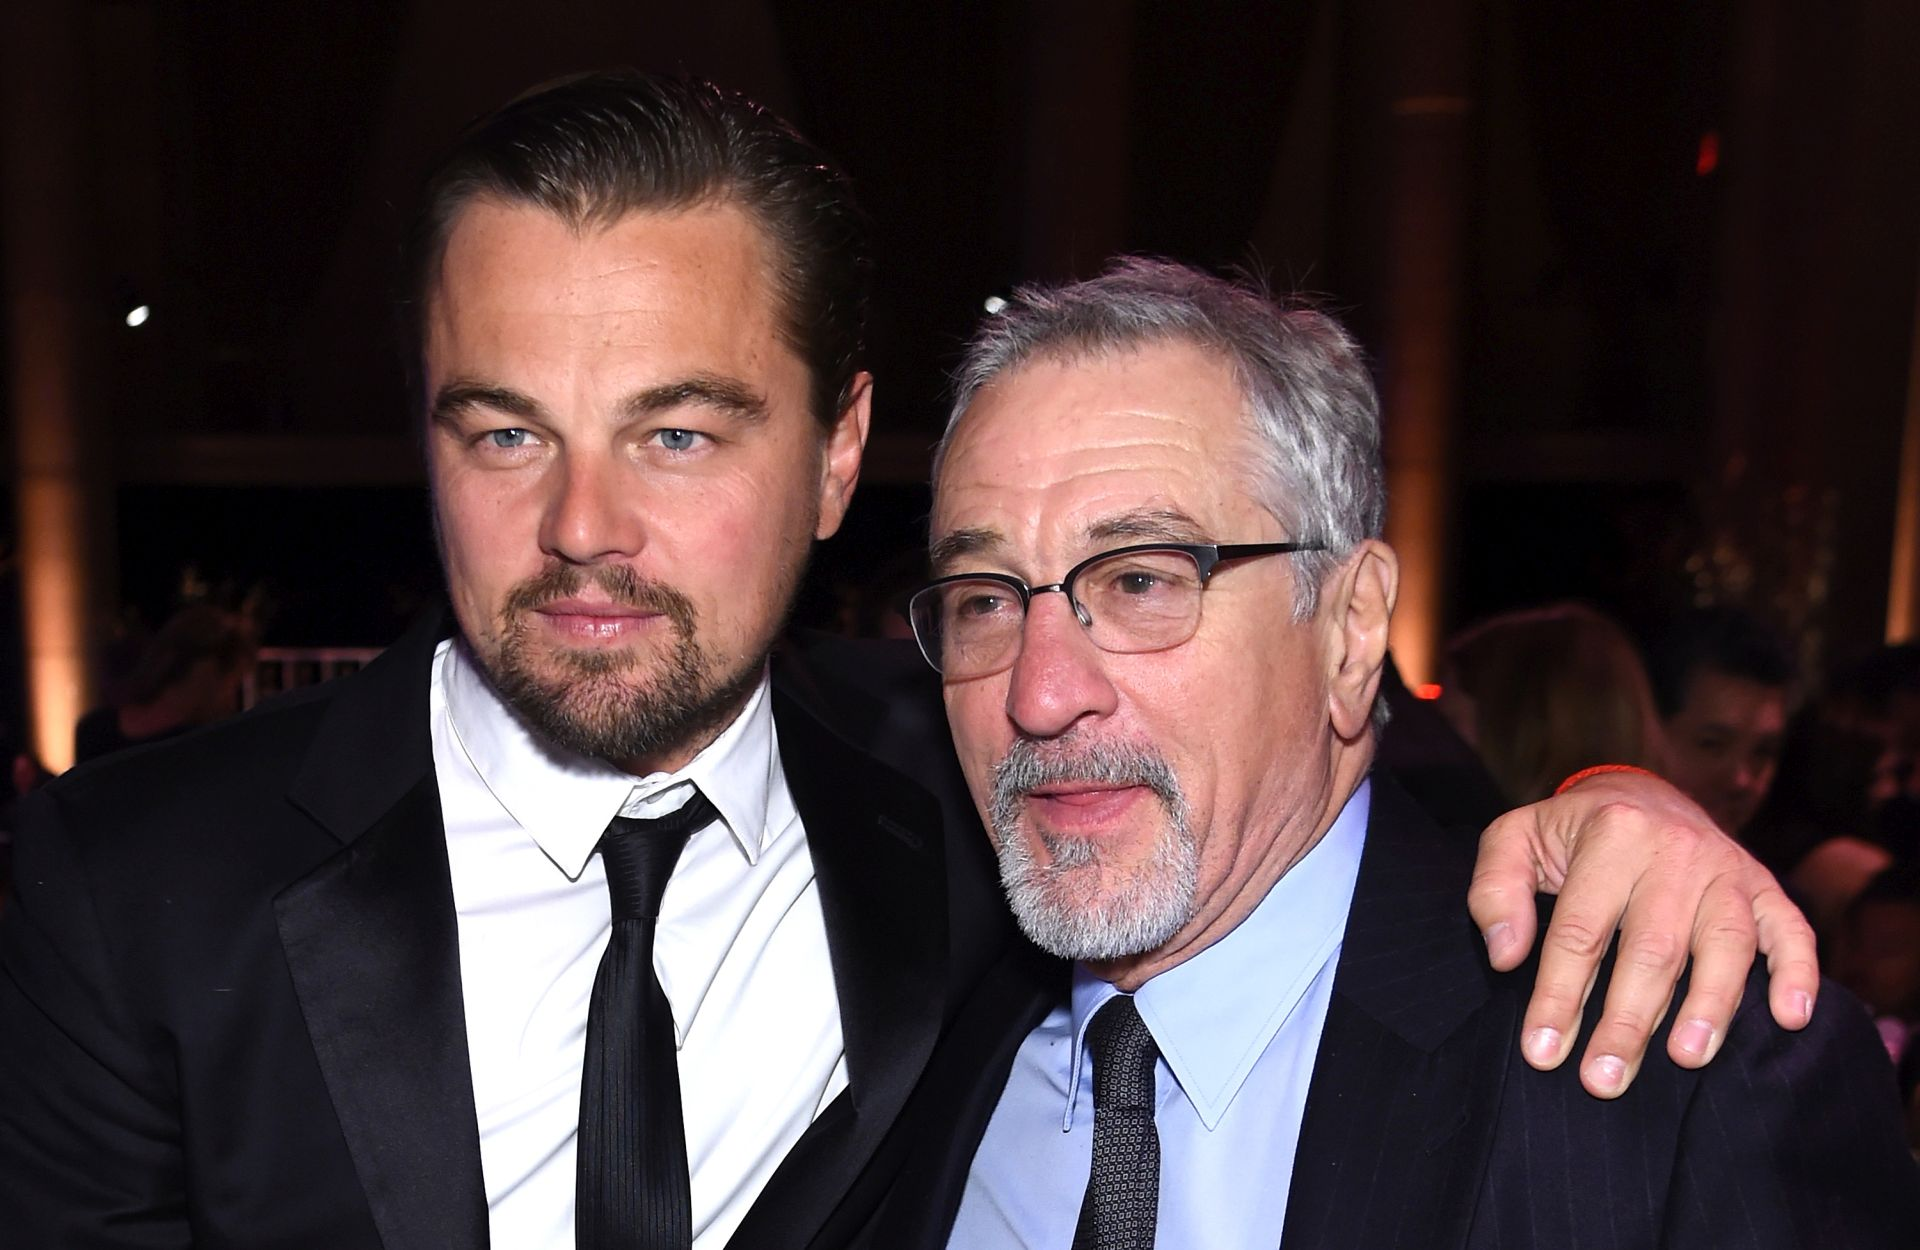 CANNES, 9. DAN: Seks, smrt i dobrotvor Leonardo DiCaprio